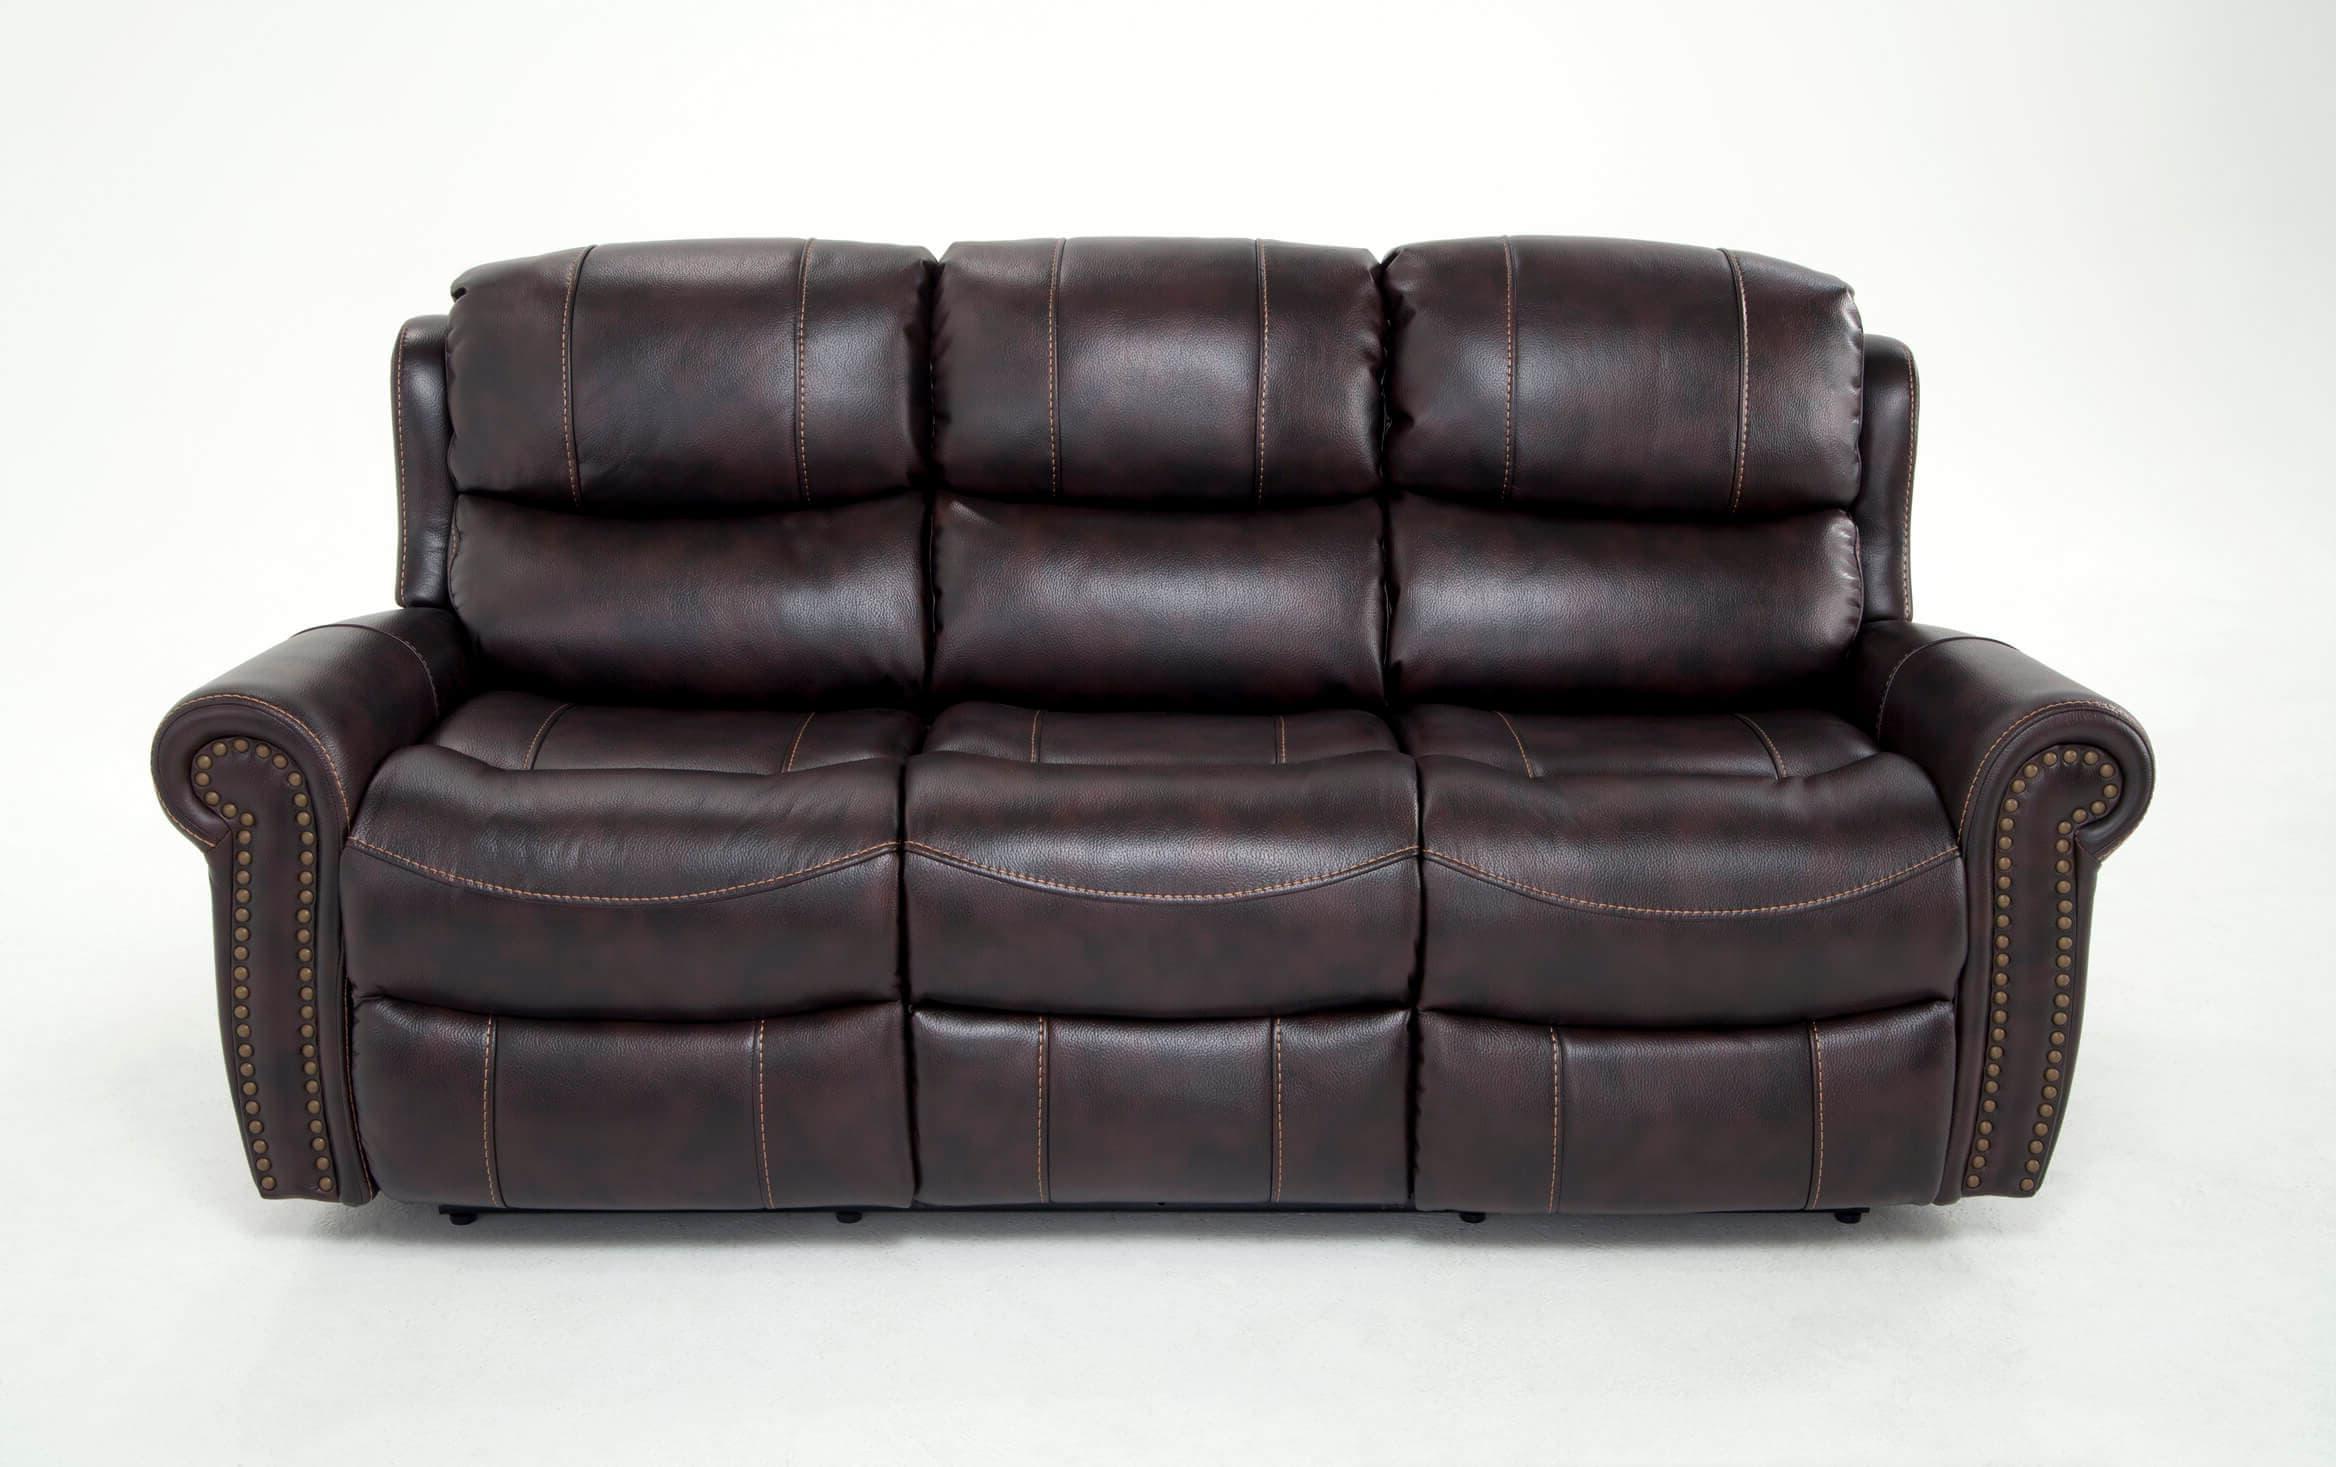 Trailblazer Gray Leather Power Reclining Sofas Within Favorite Bobs Furniture Leather Sofa : Trailblazer Gray Leather (View 2 of 15)